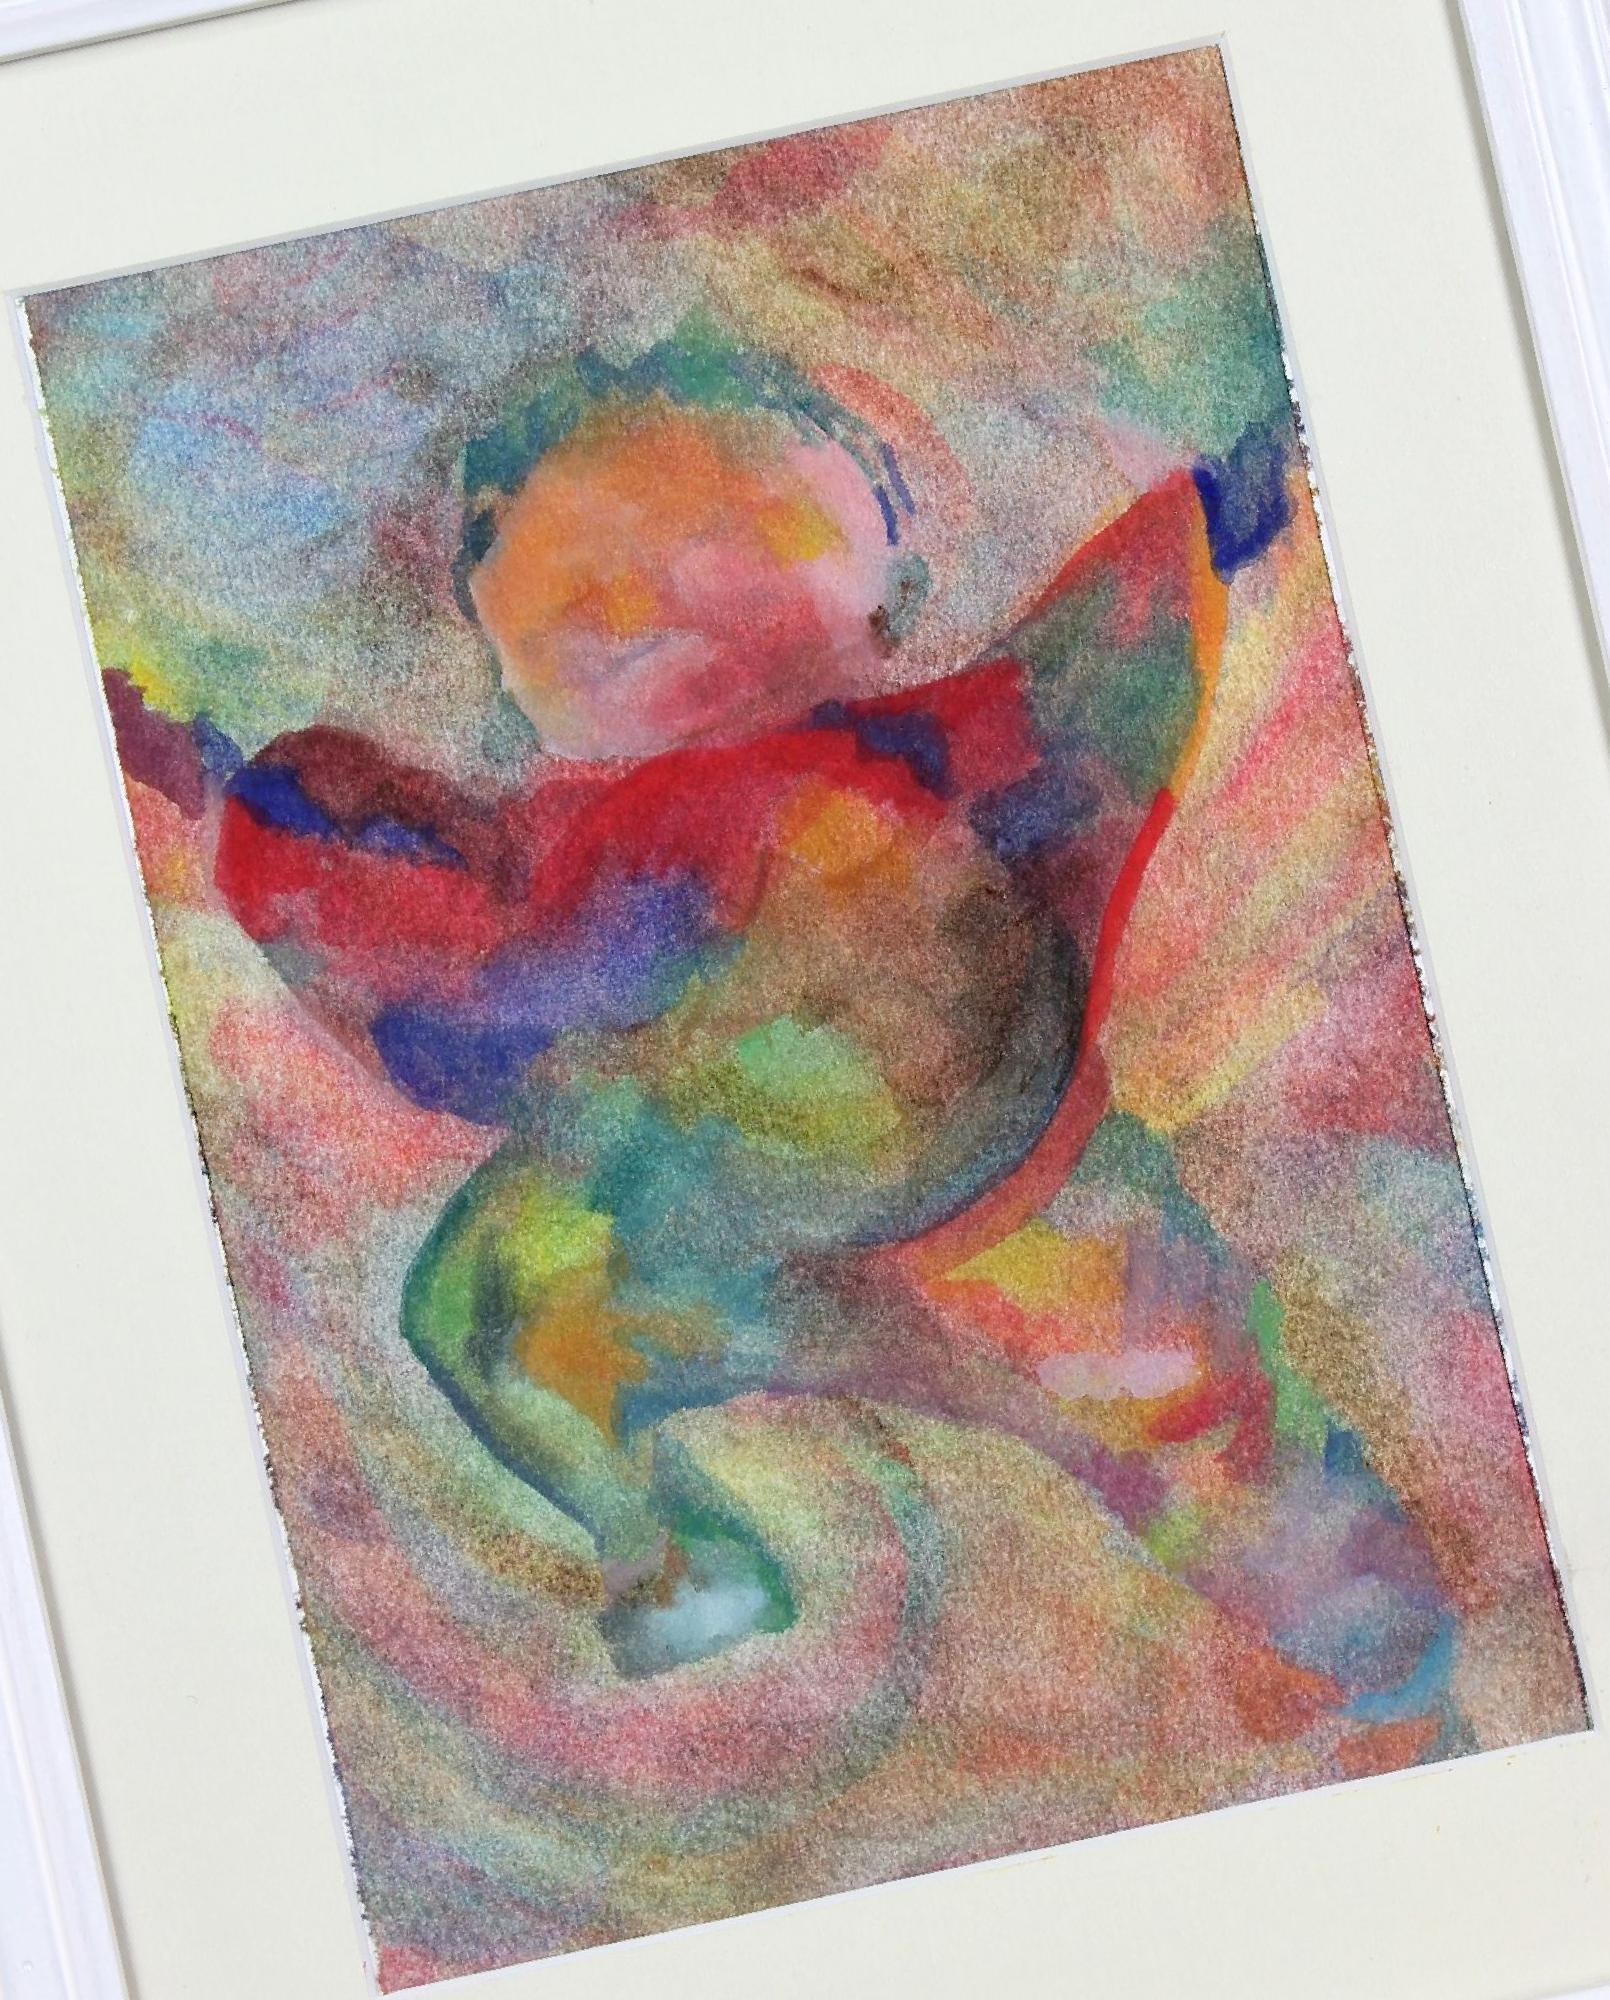 Baby Jane, watercolour